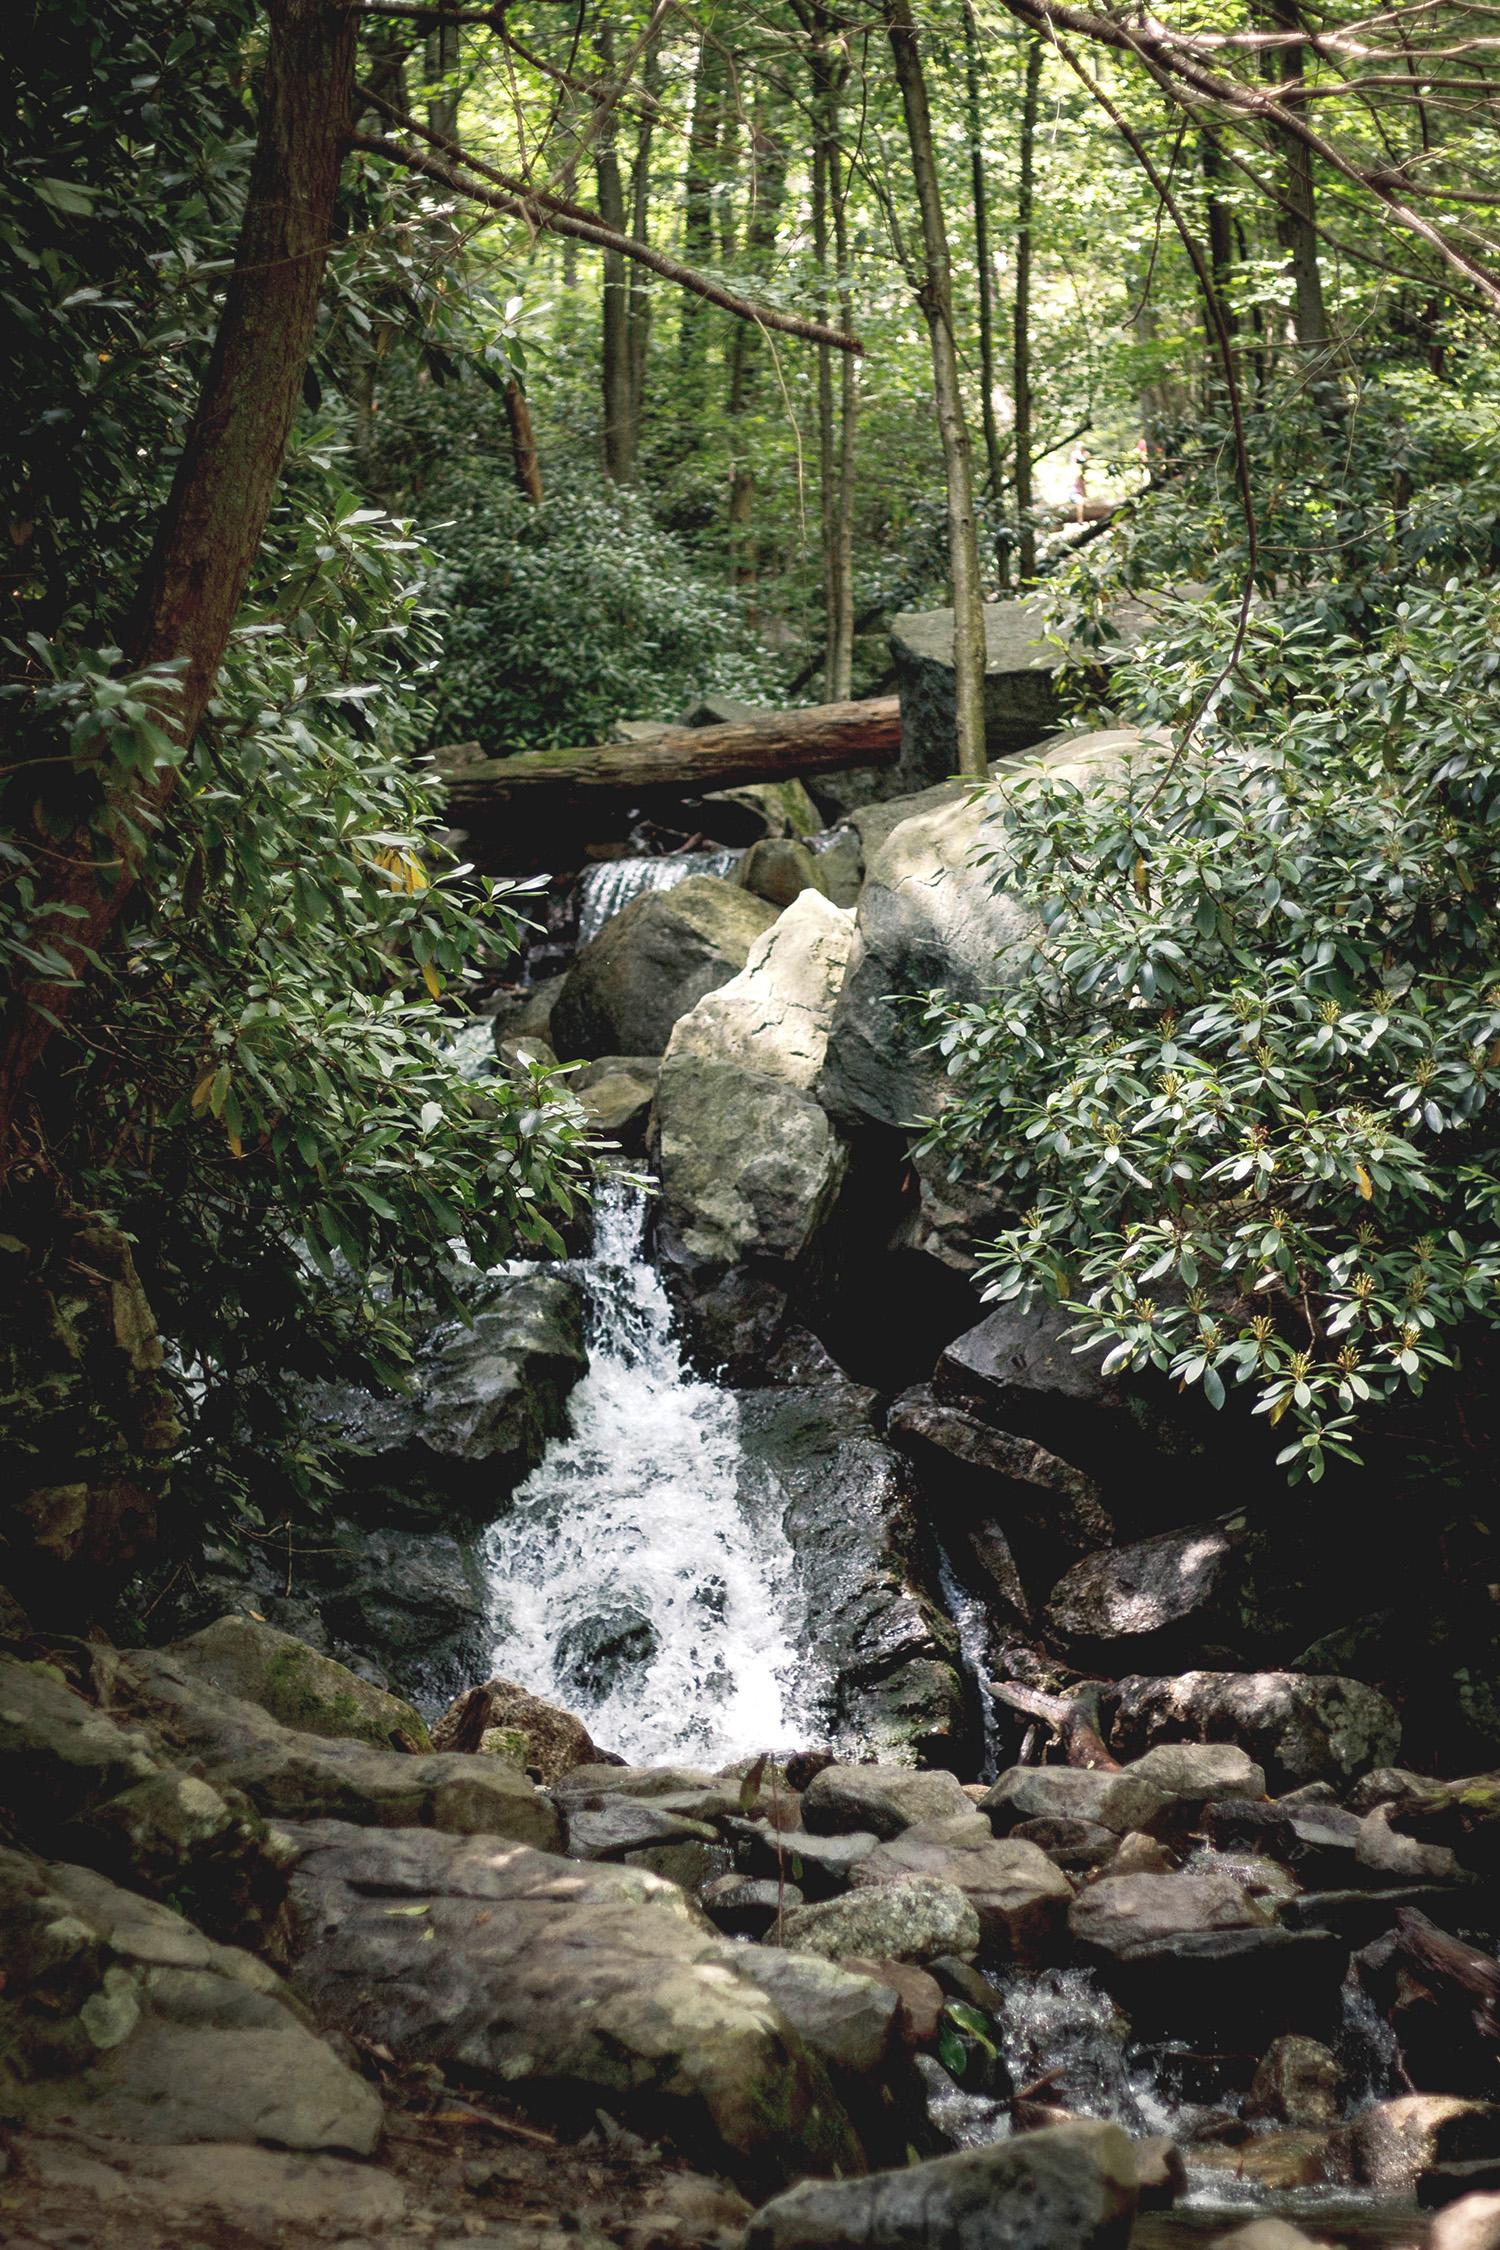 glen onoko falls, pennsylvania | image via: bekuh b.